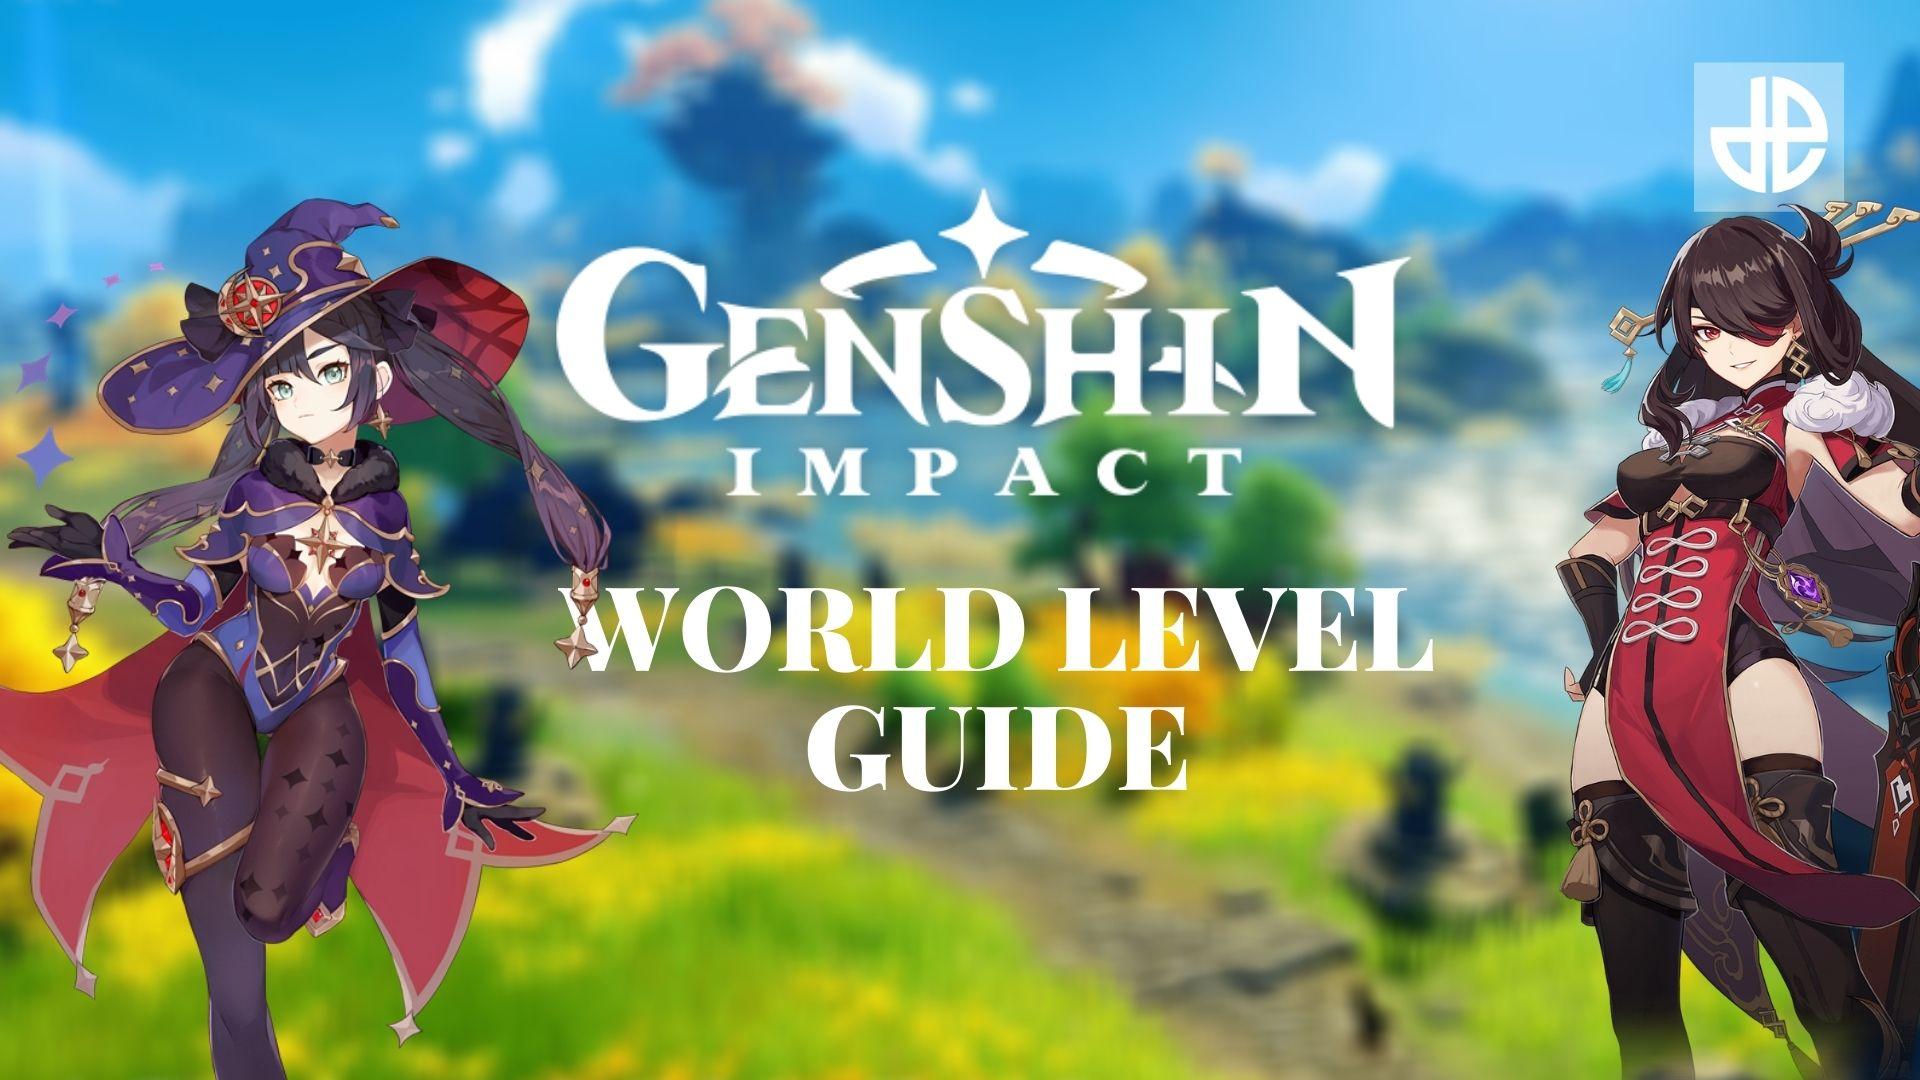 Genshin Impact World Level Guide